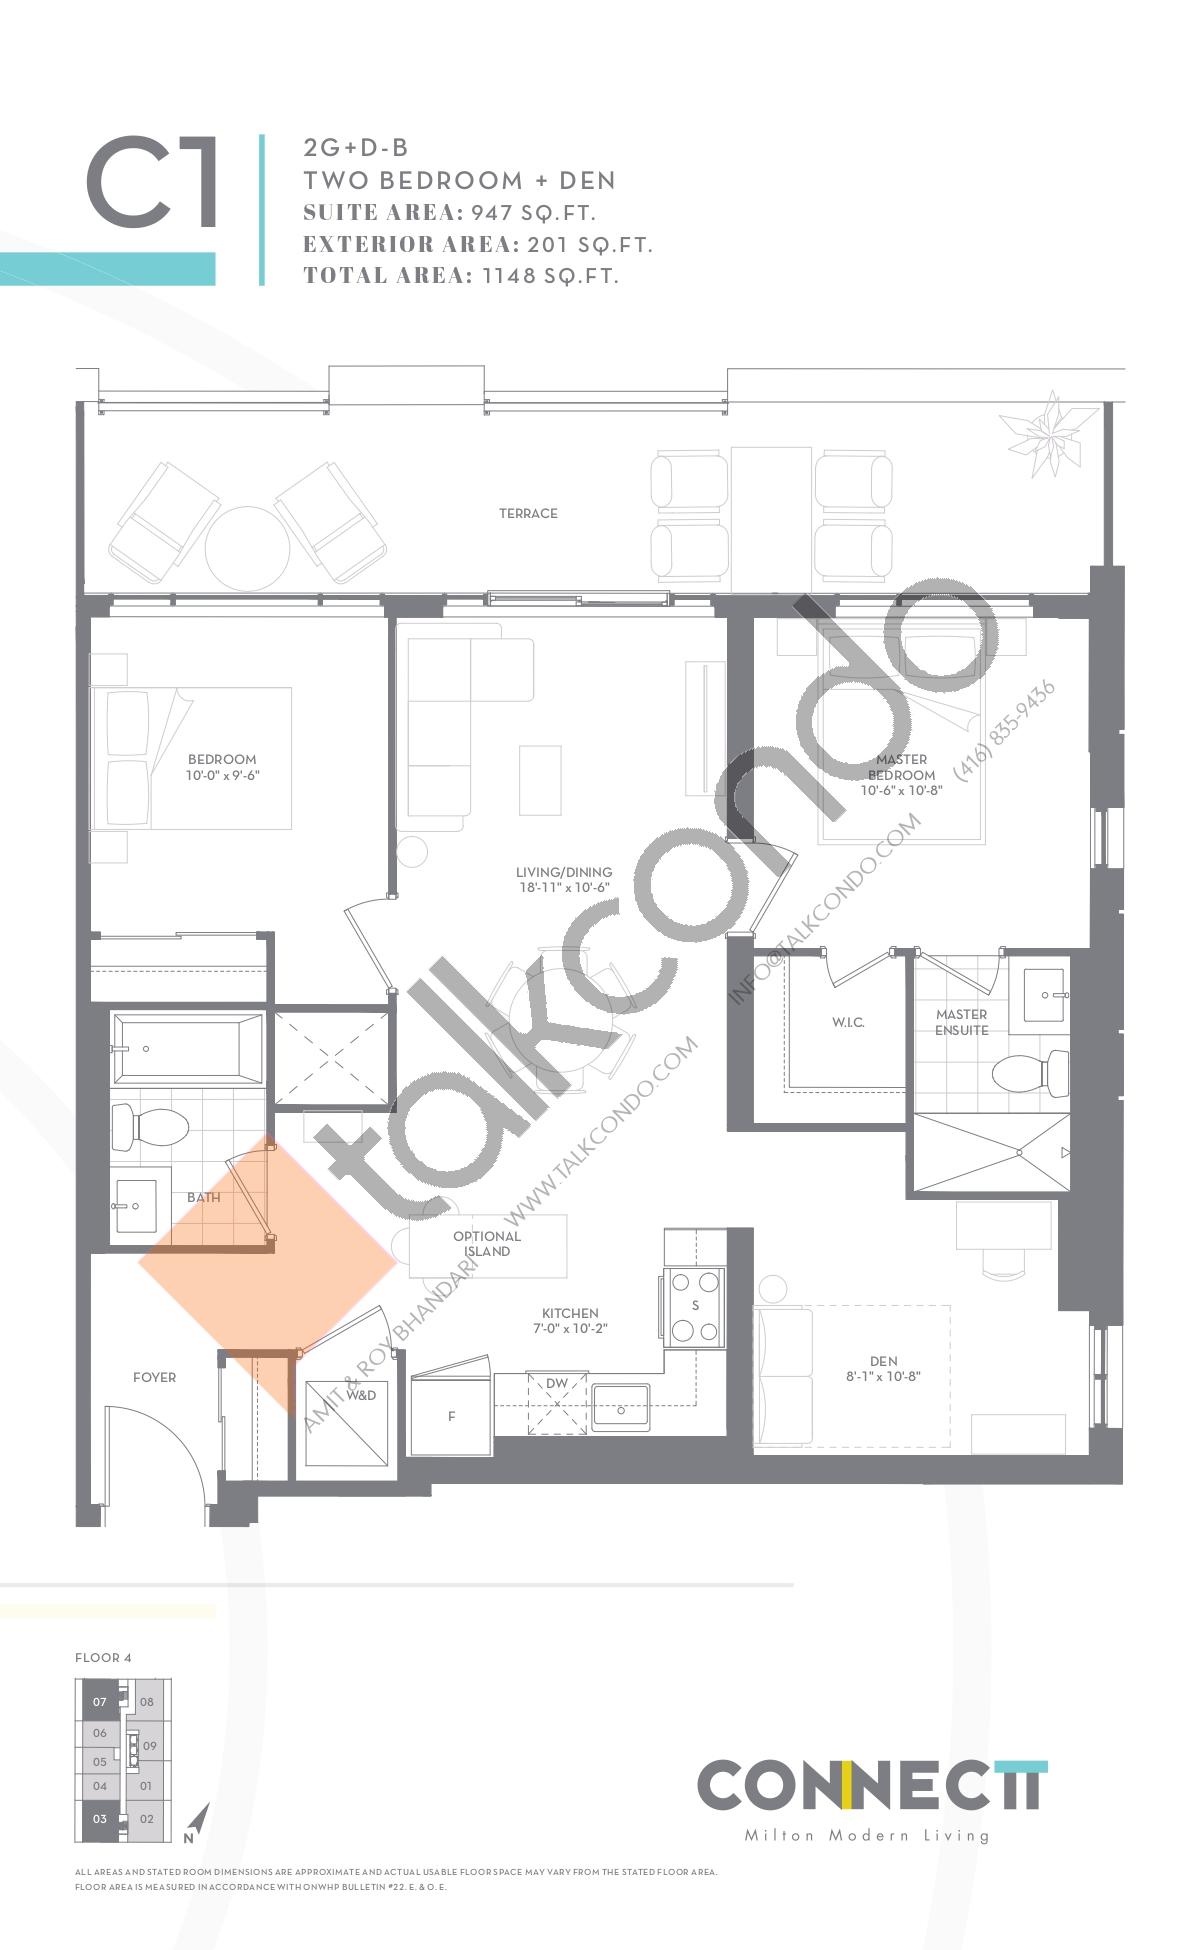 2G+D-B Floor Plan at Connectt Urban Community Condos - 947 sq.ft